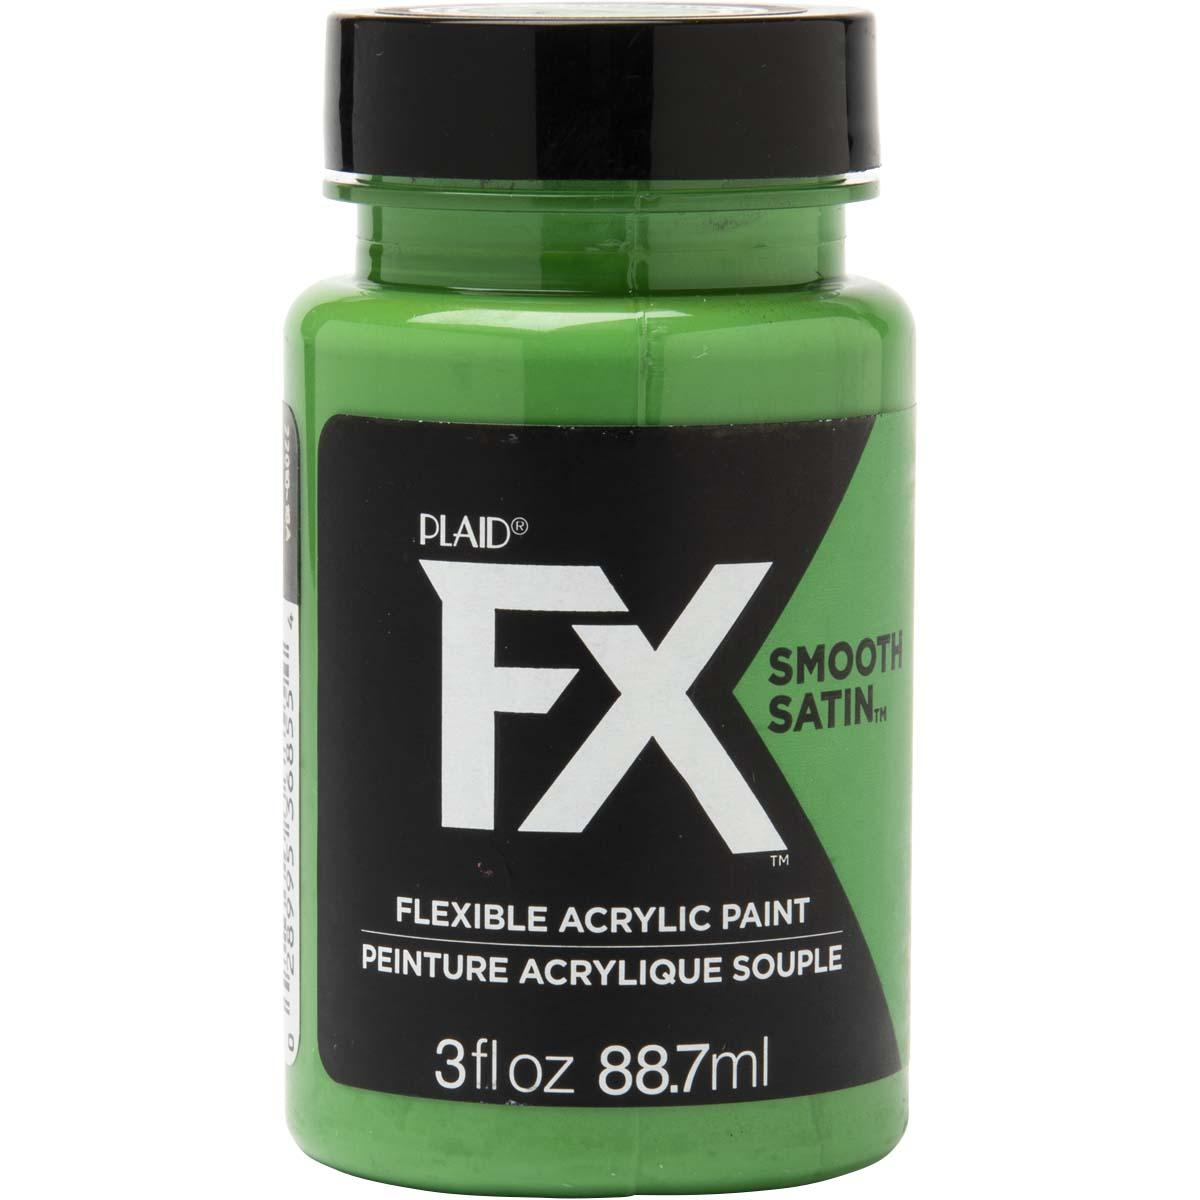 PlaidFX Smooth Satin Flexible Acrylic Paint - Smashing, 3 oz. - 36855